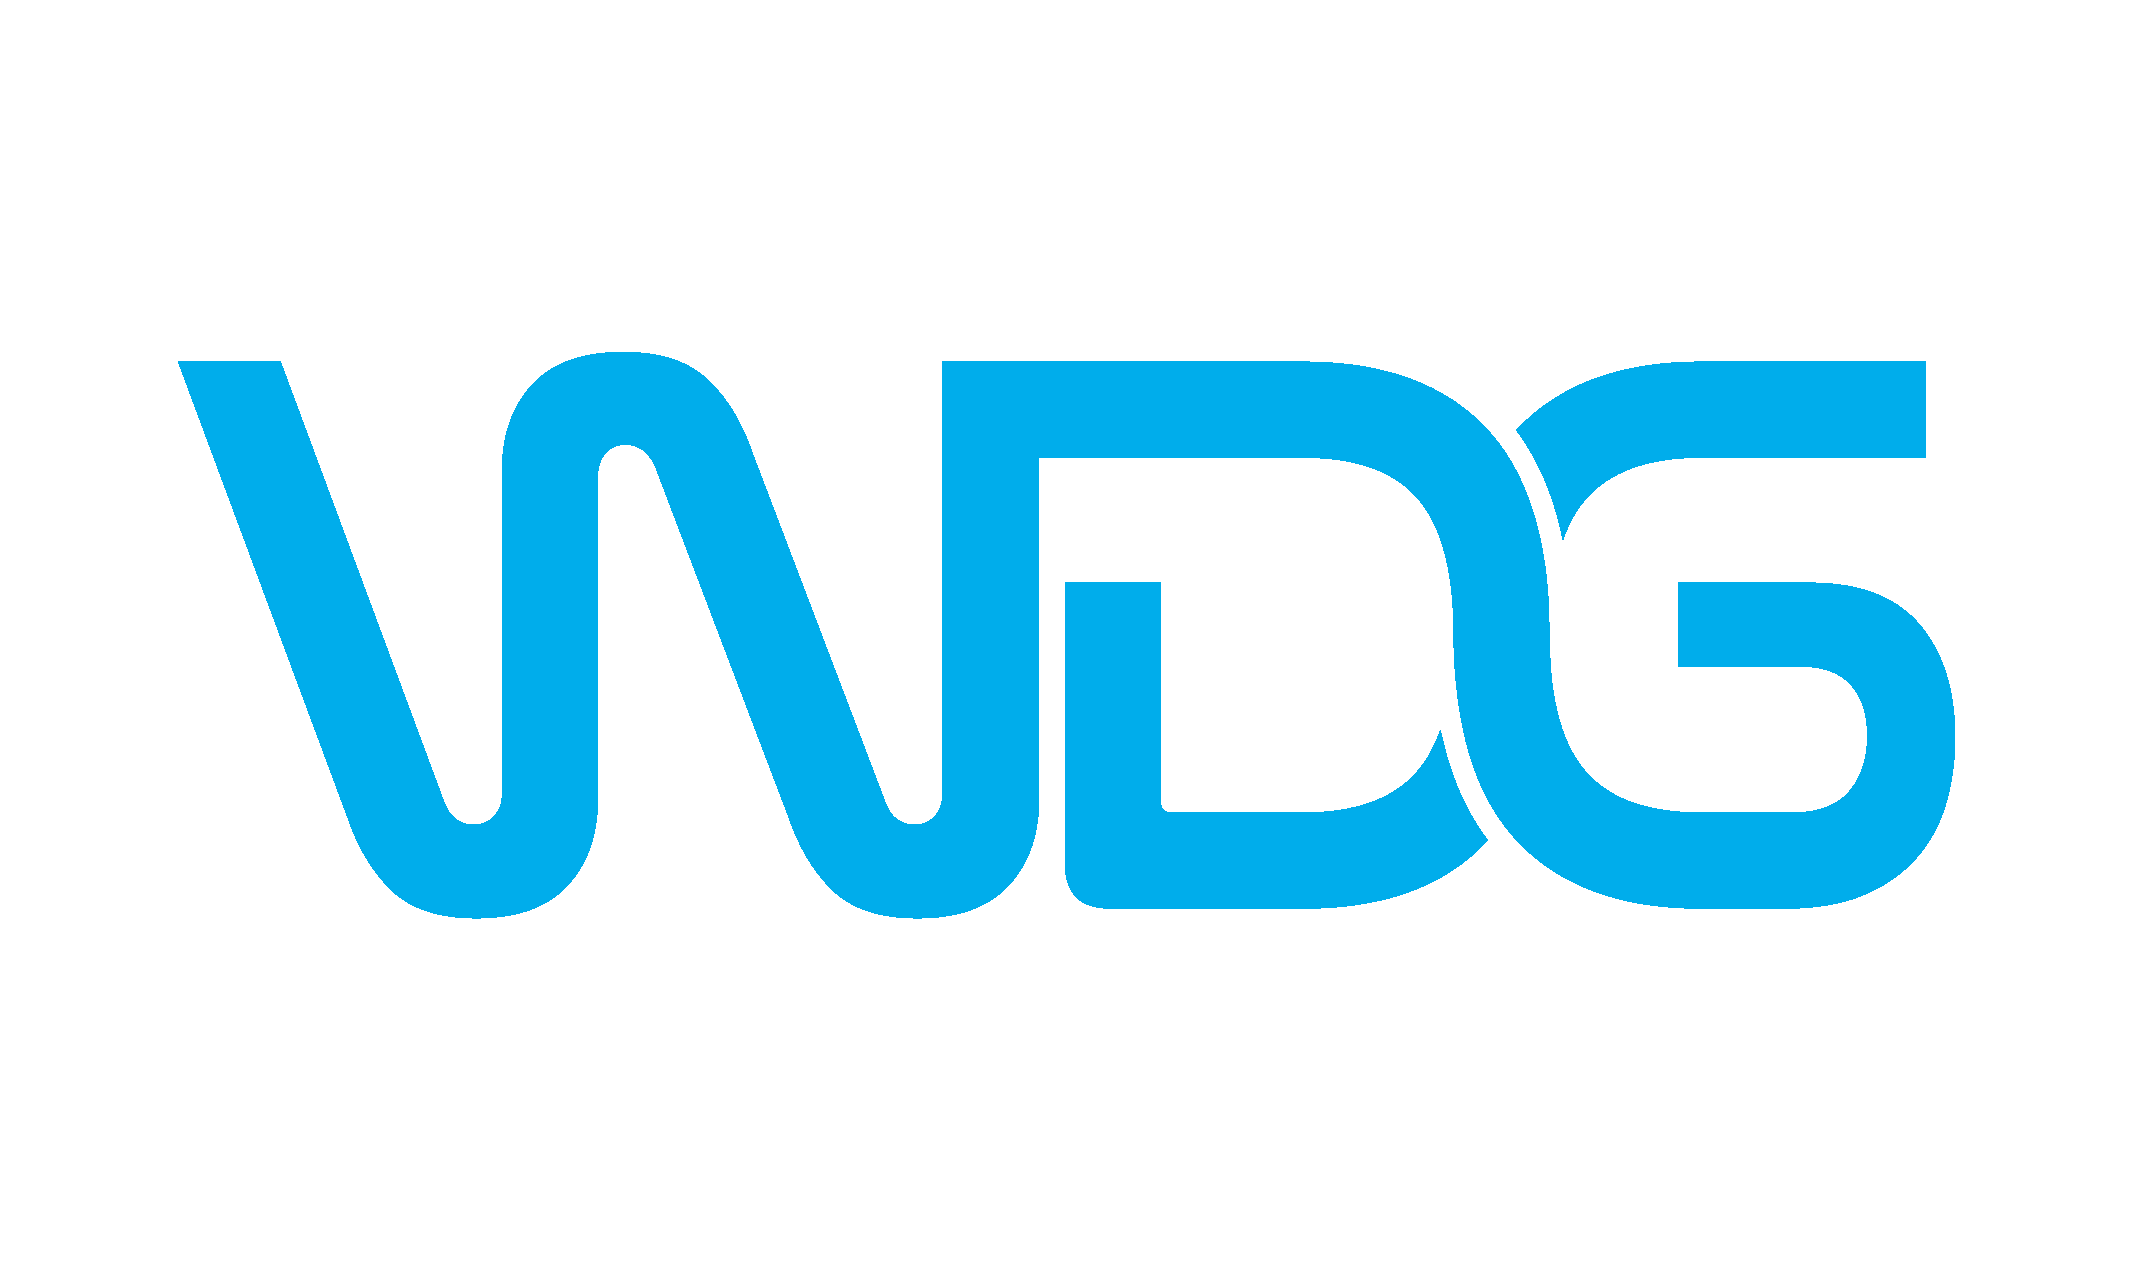 web design geelong - logo